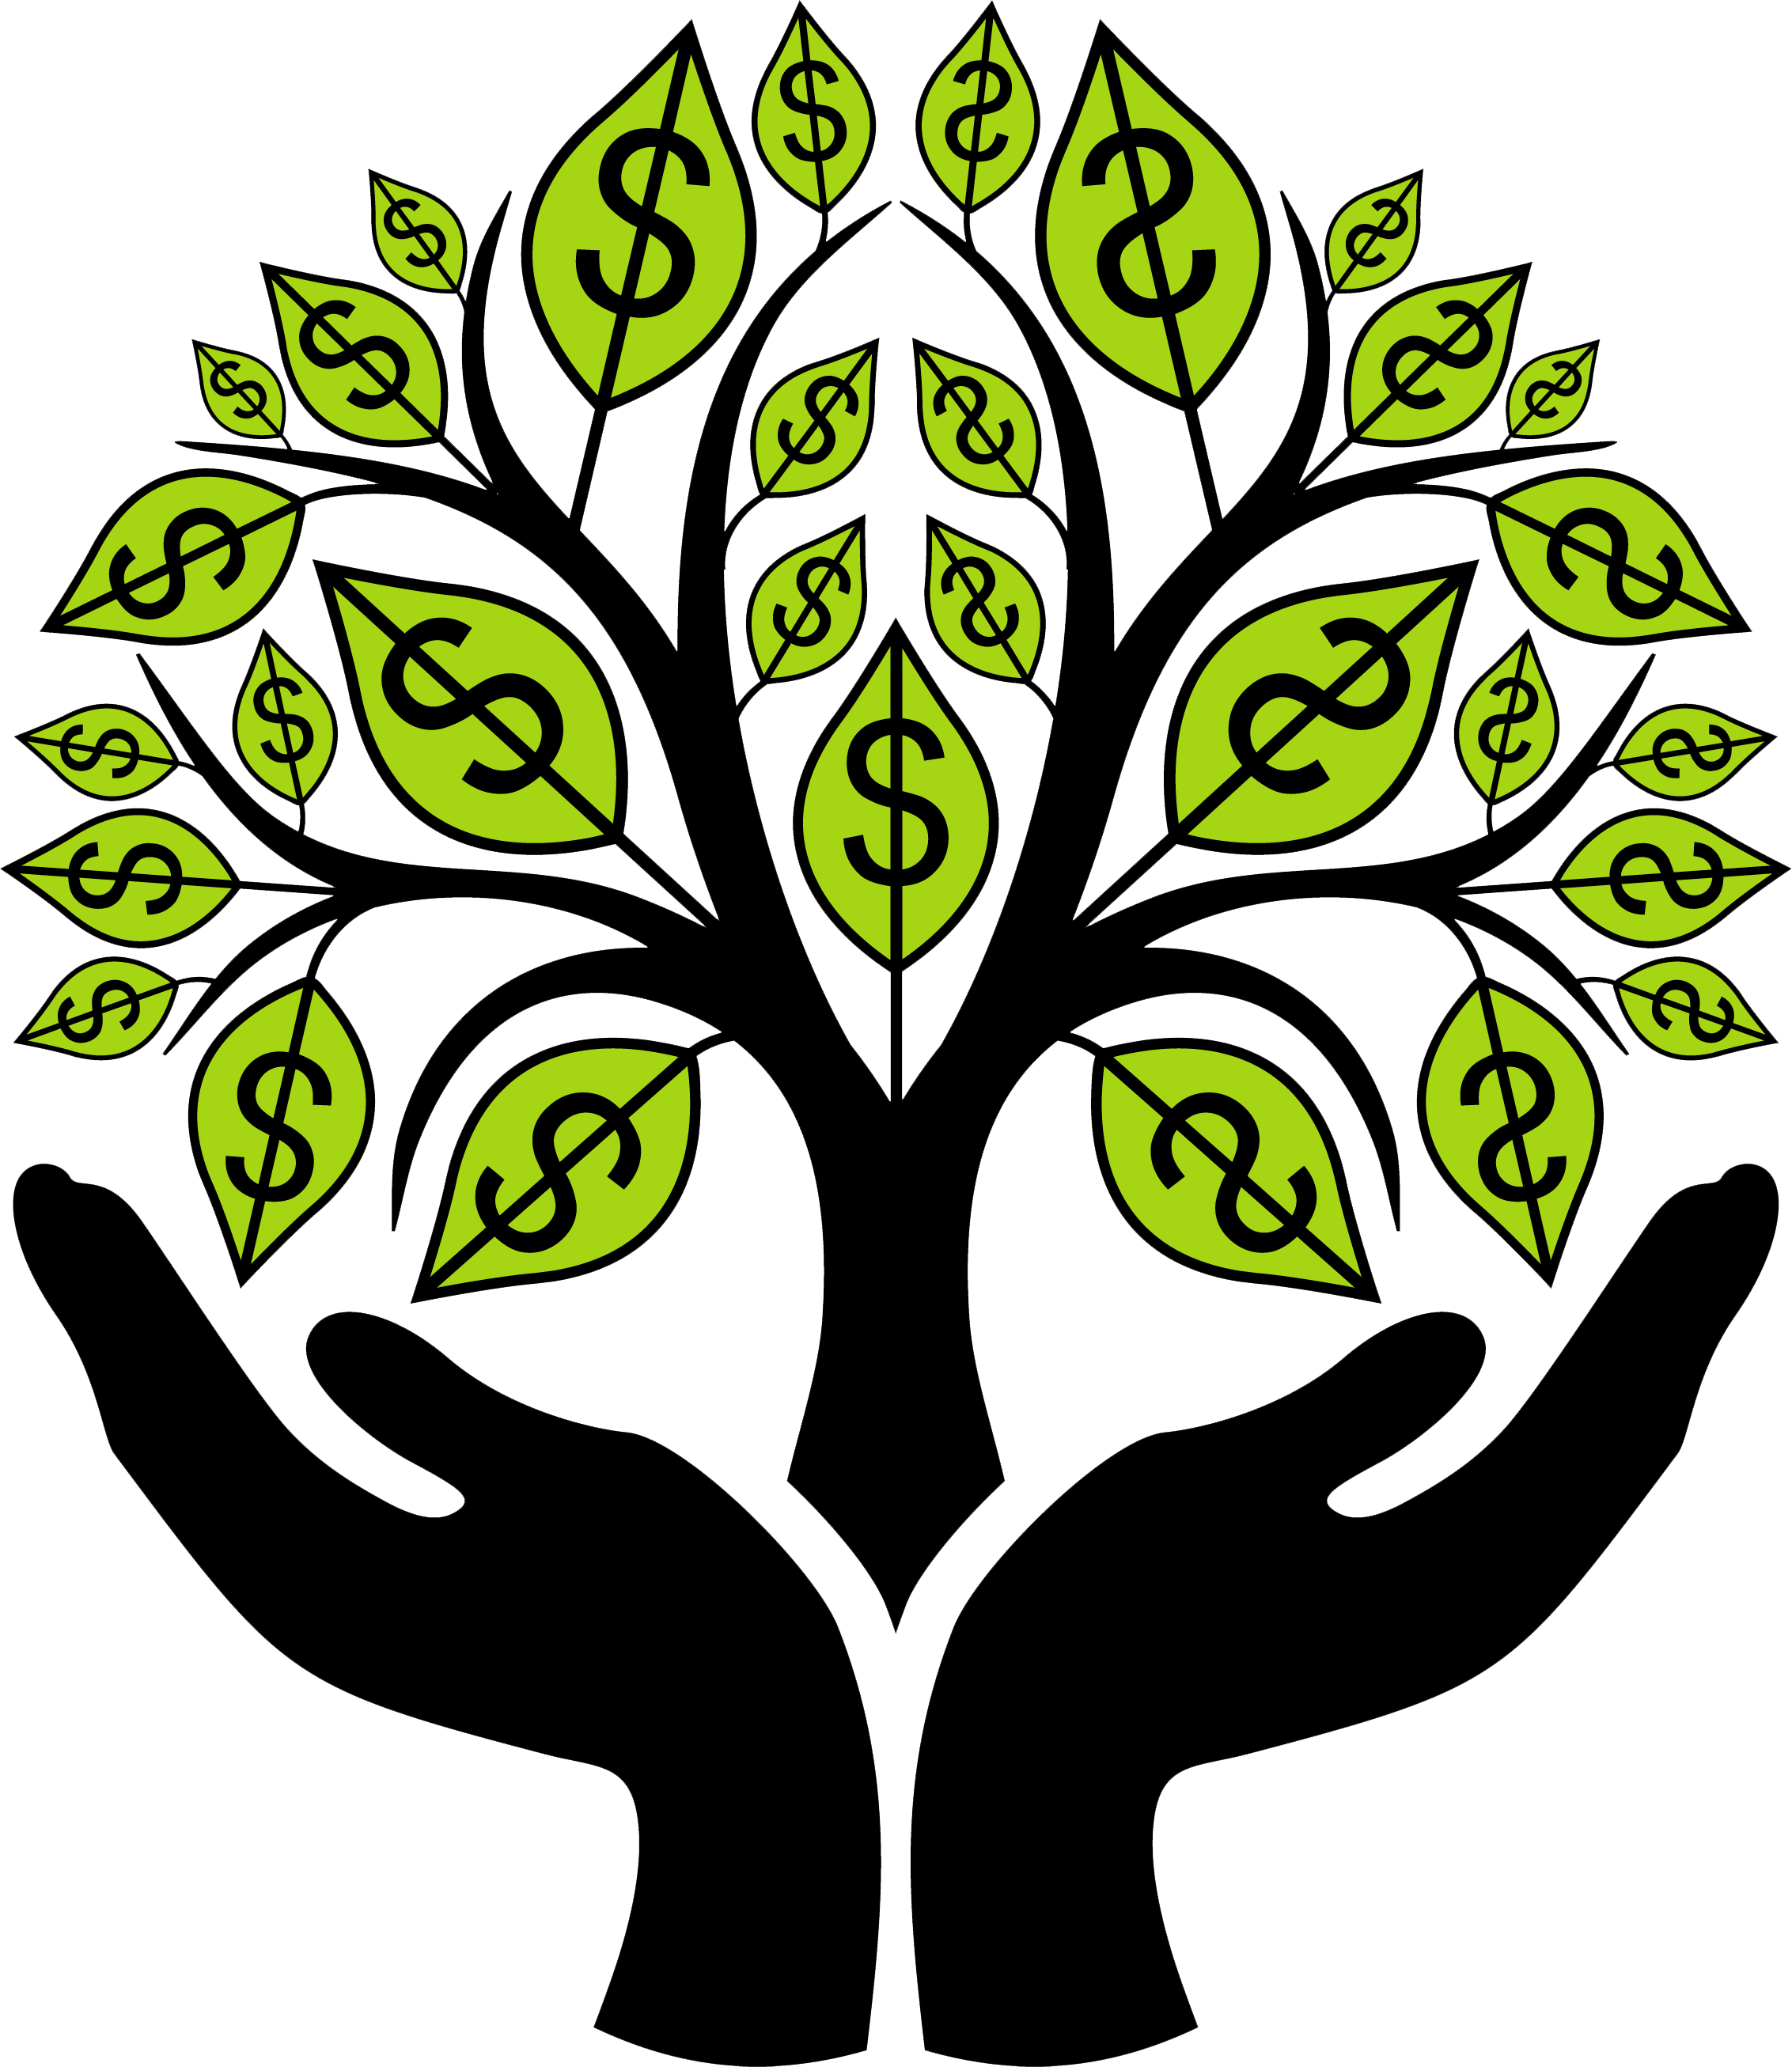 Money clipart money tree. Financing hvac in canoga